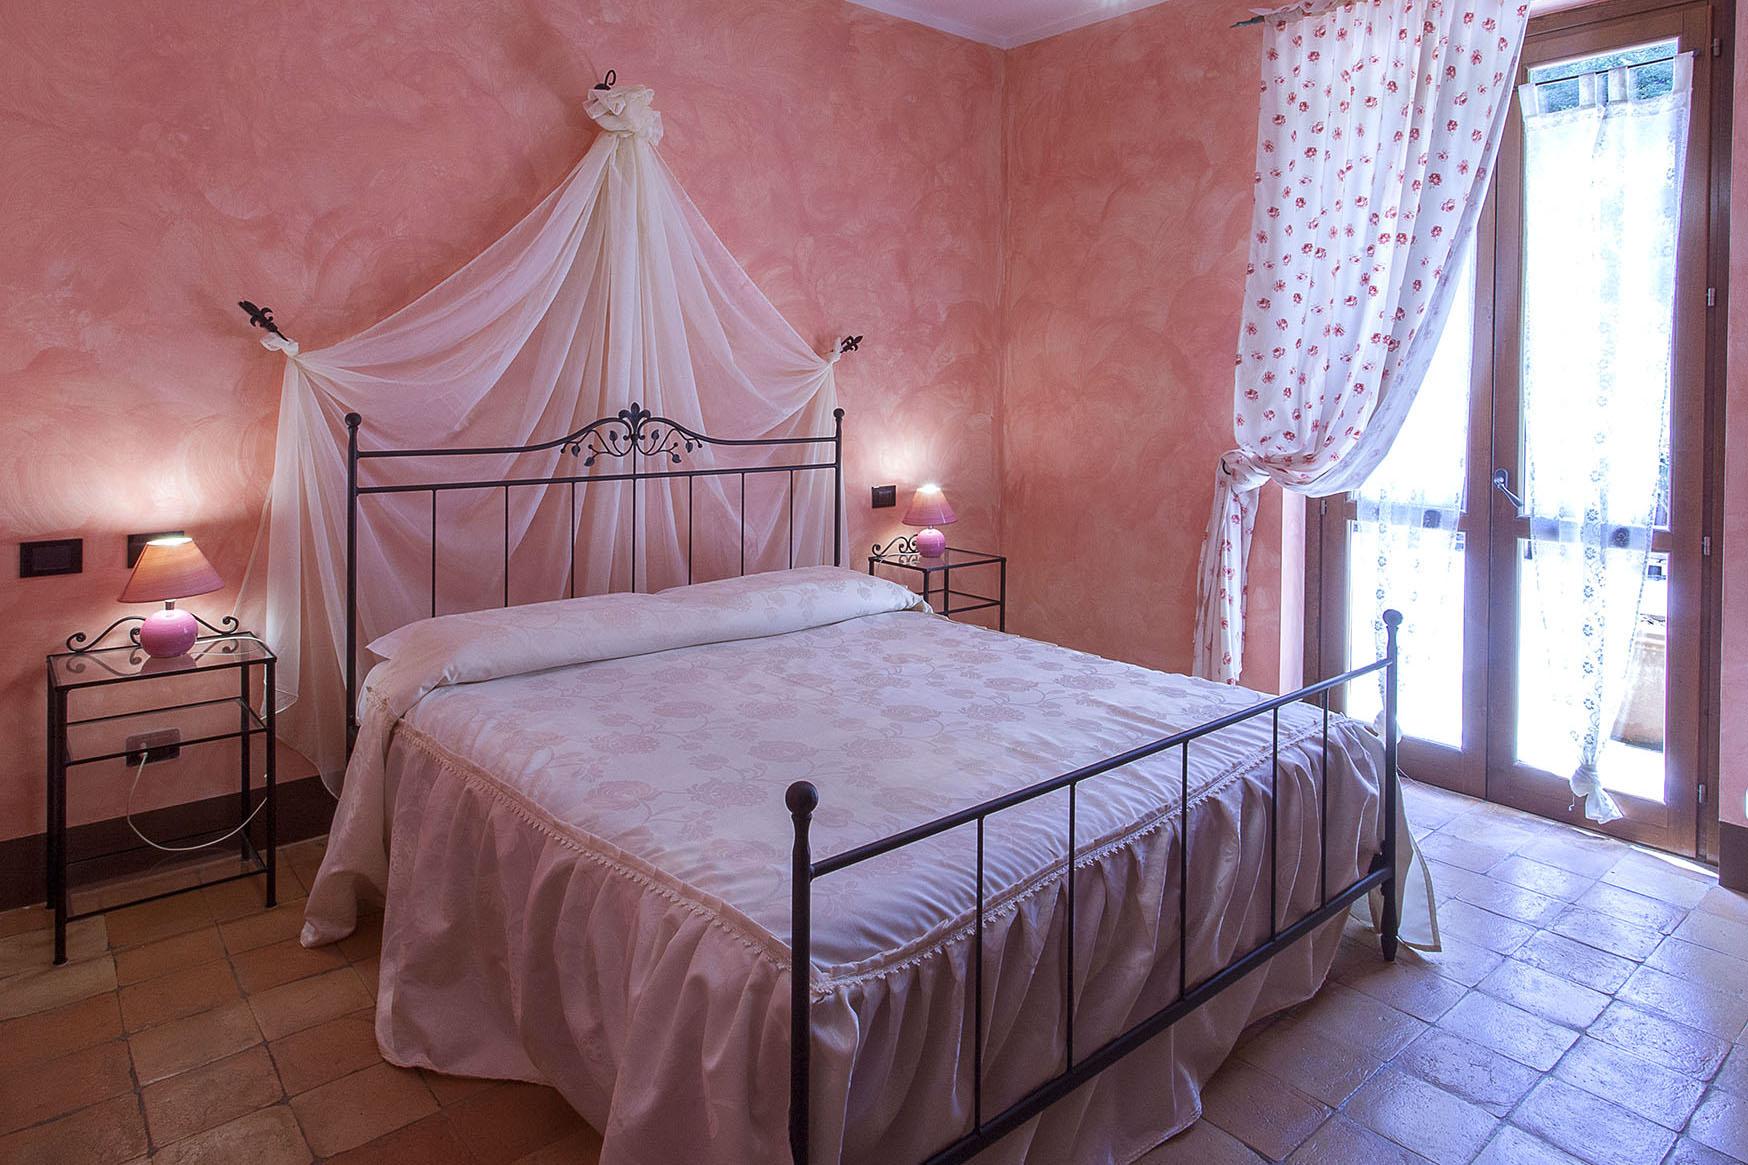 La Gismonda camera rosa